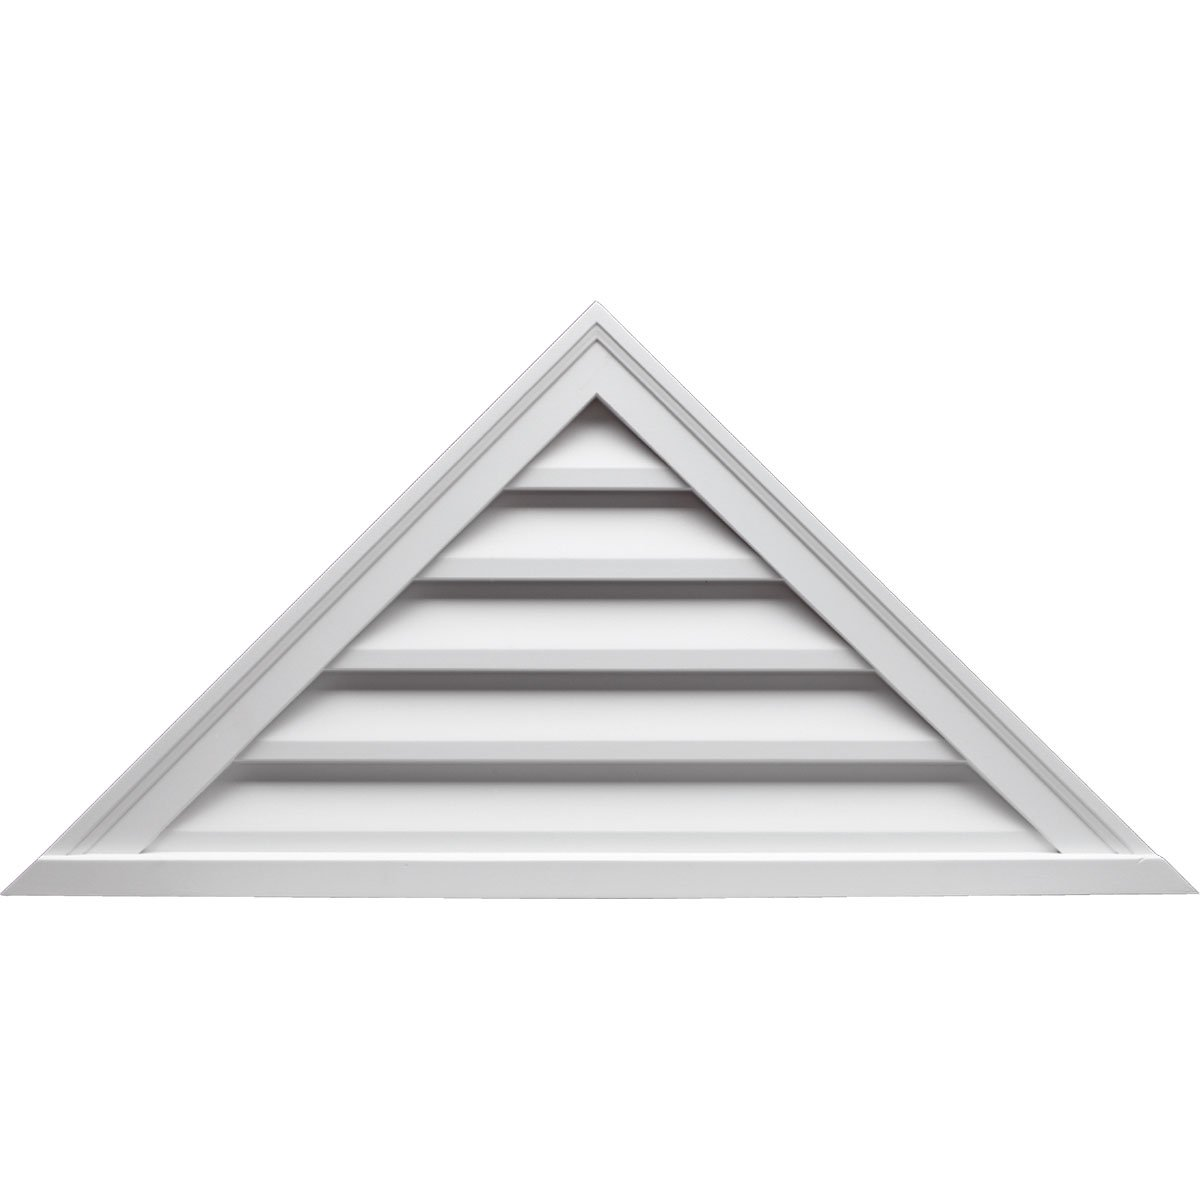 Fypon TRLV48X18 48''W x 18''H Triangle Louver, 9/12 Pitch, Decorative